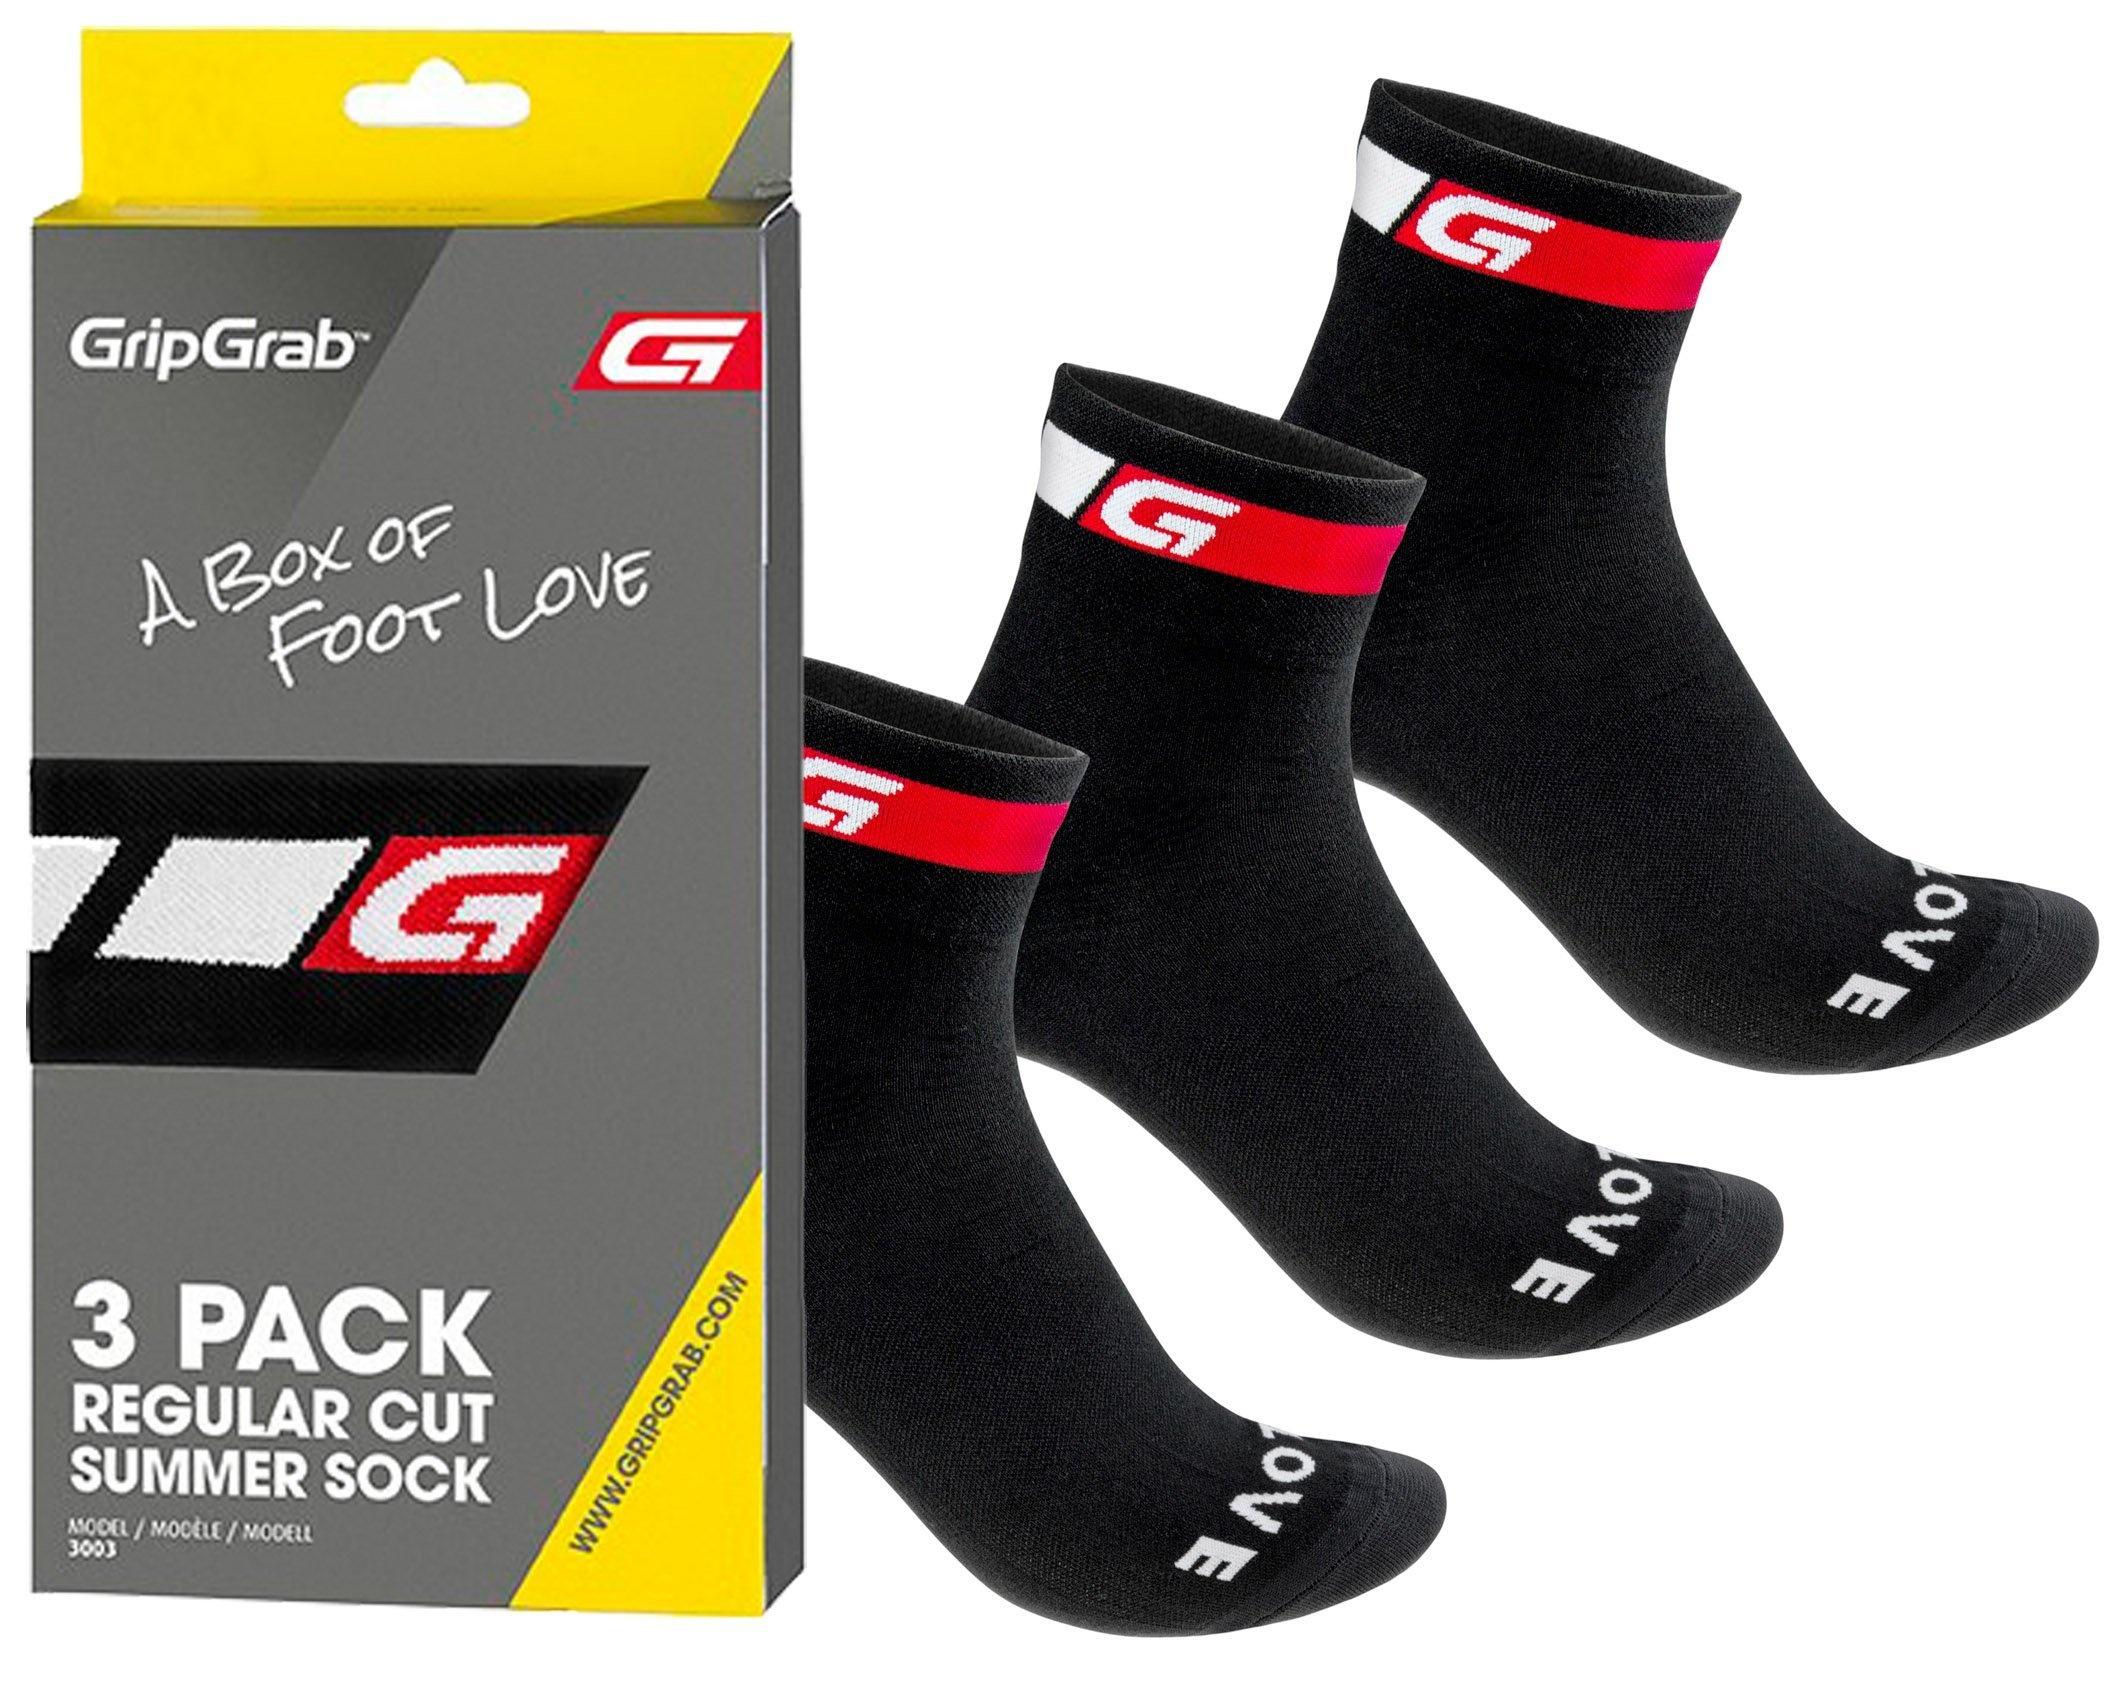 Gripgrab 3-Pack Regular Cut Summer Sock, Sort